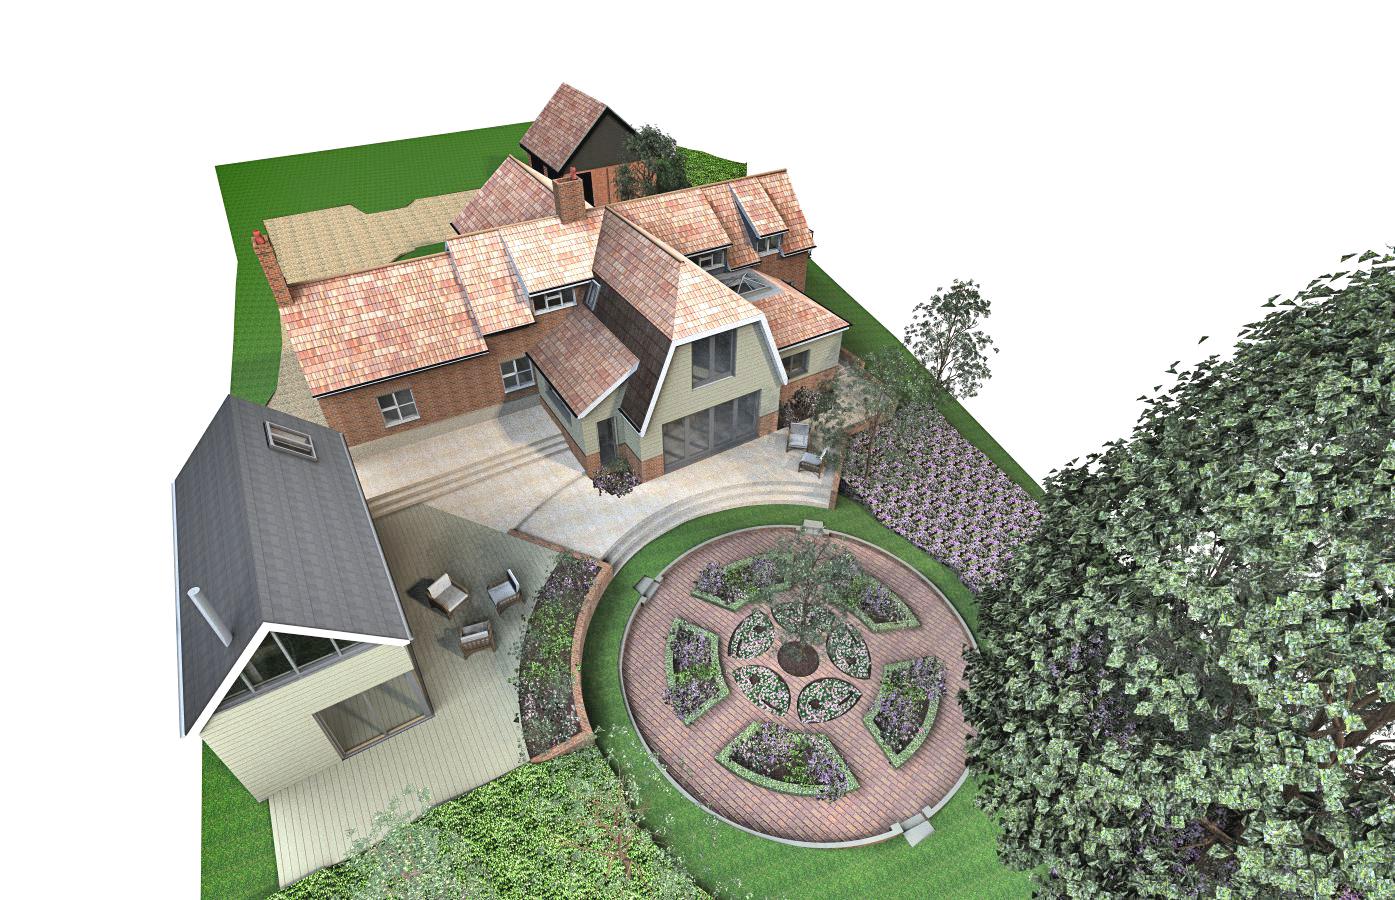 2014-06-26 PL066 Rose Cottage, Aerial View M.jpg